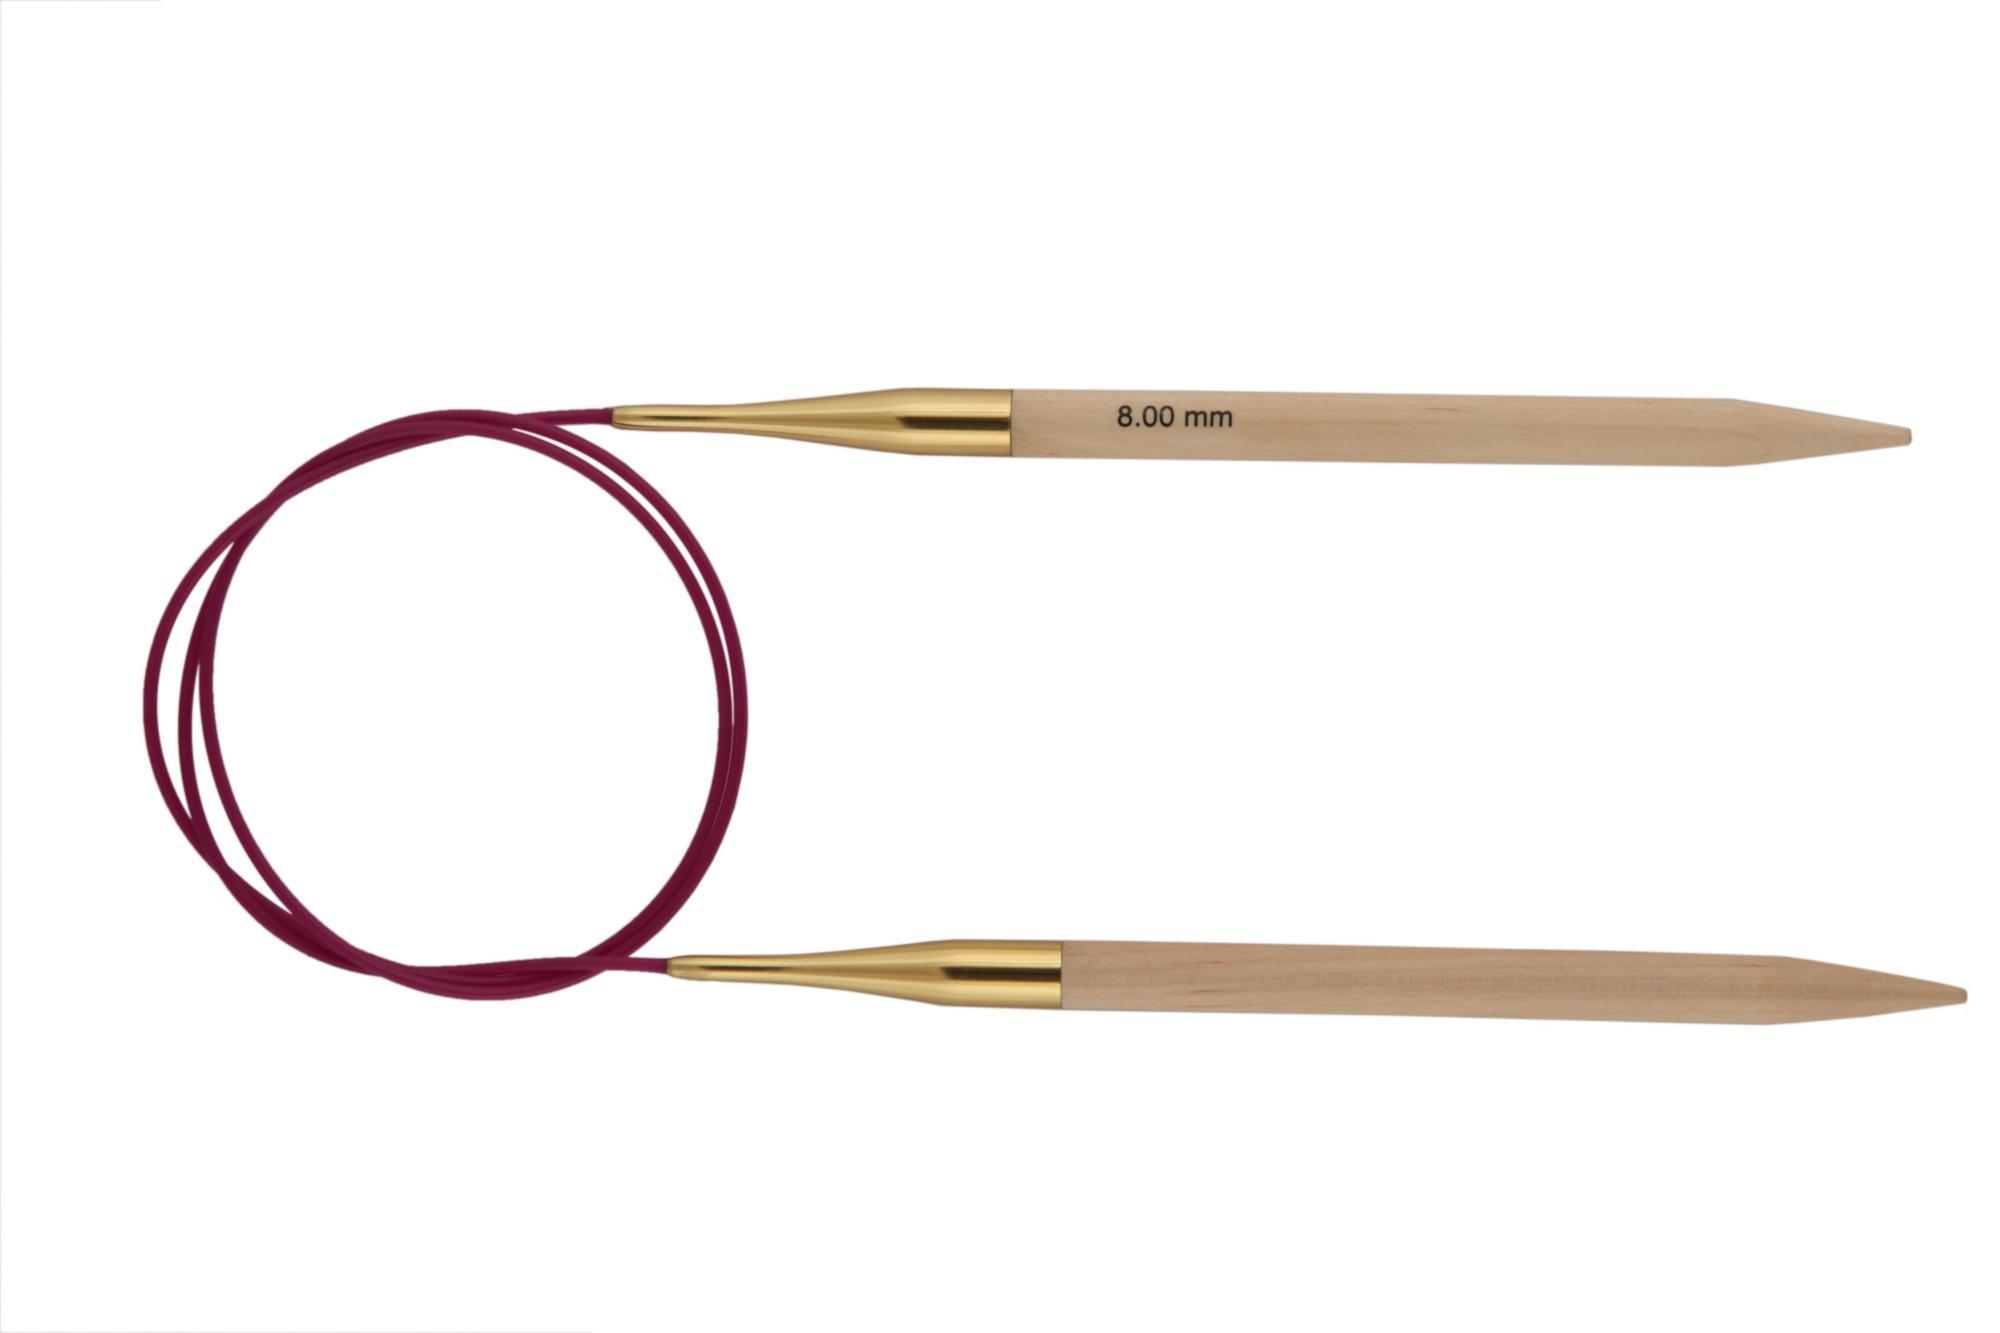 Спицы круговые 40 см Basix Birch Wood KnitPro, 35315, 8.00 мм